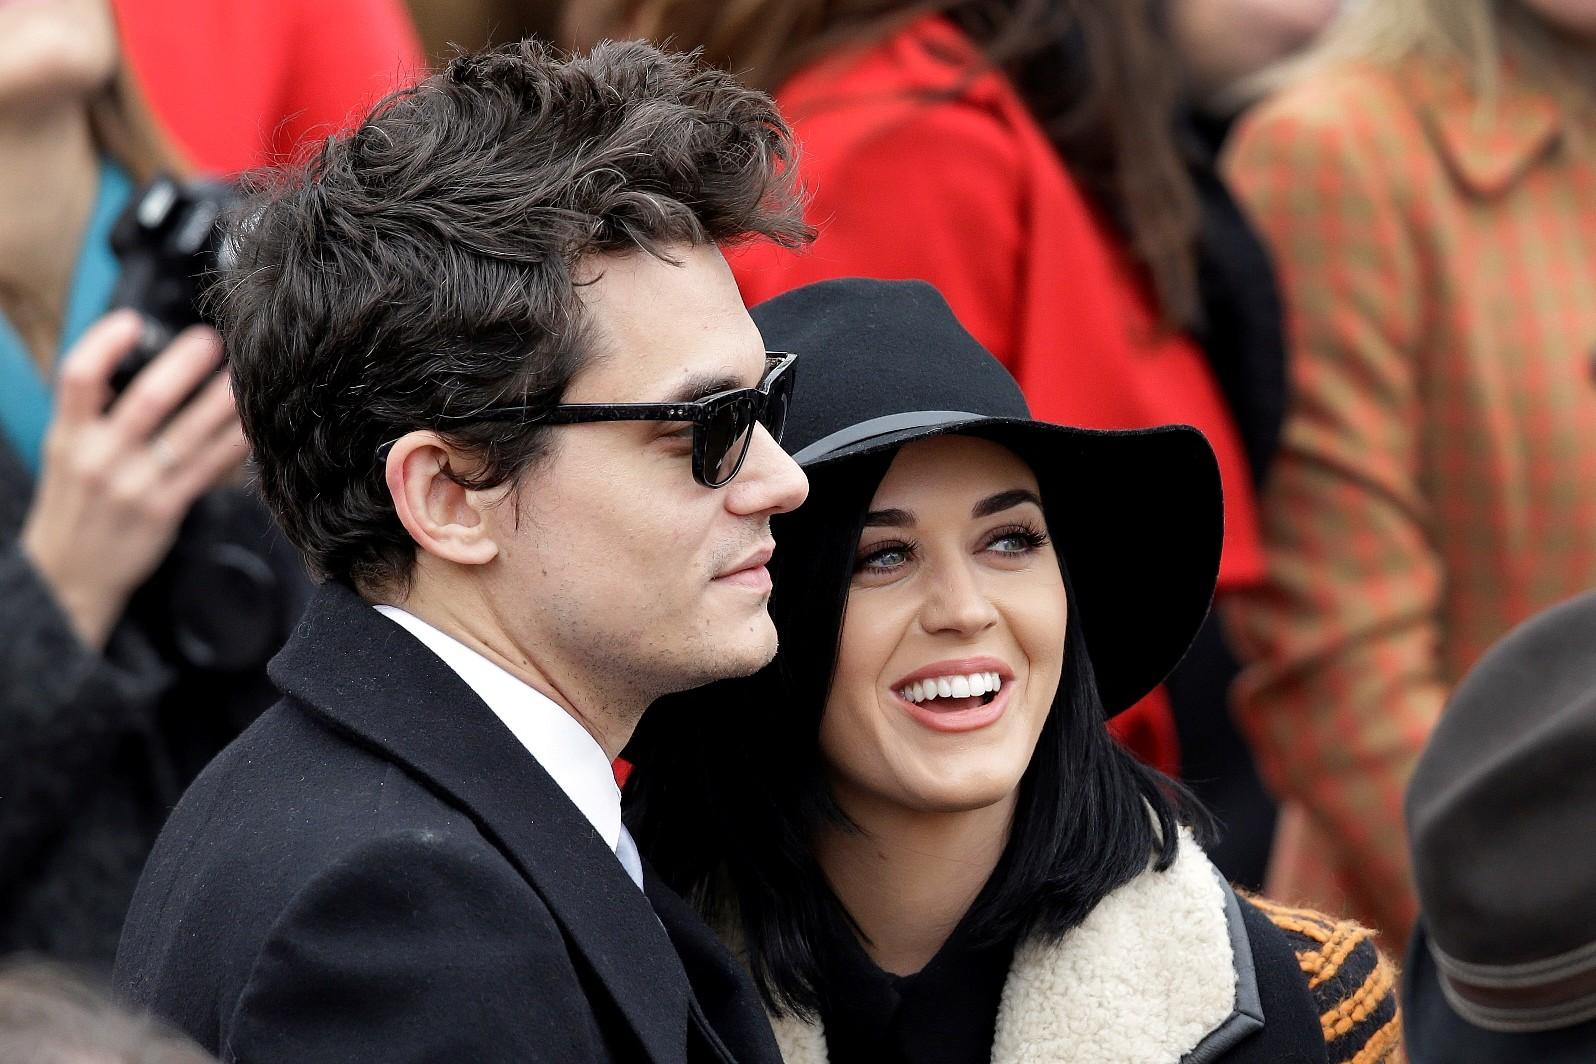 Katy Perry e John Mayer juntinhos, para delrio dos fs (Foto: J Scott Applewhite/AP)